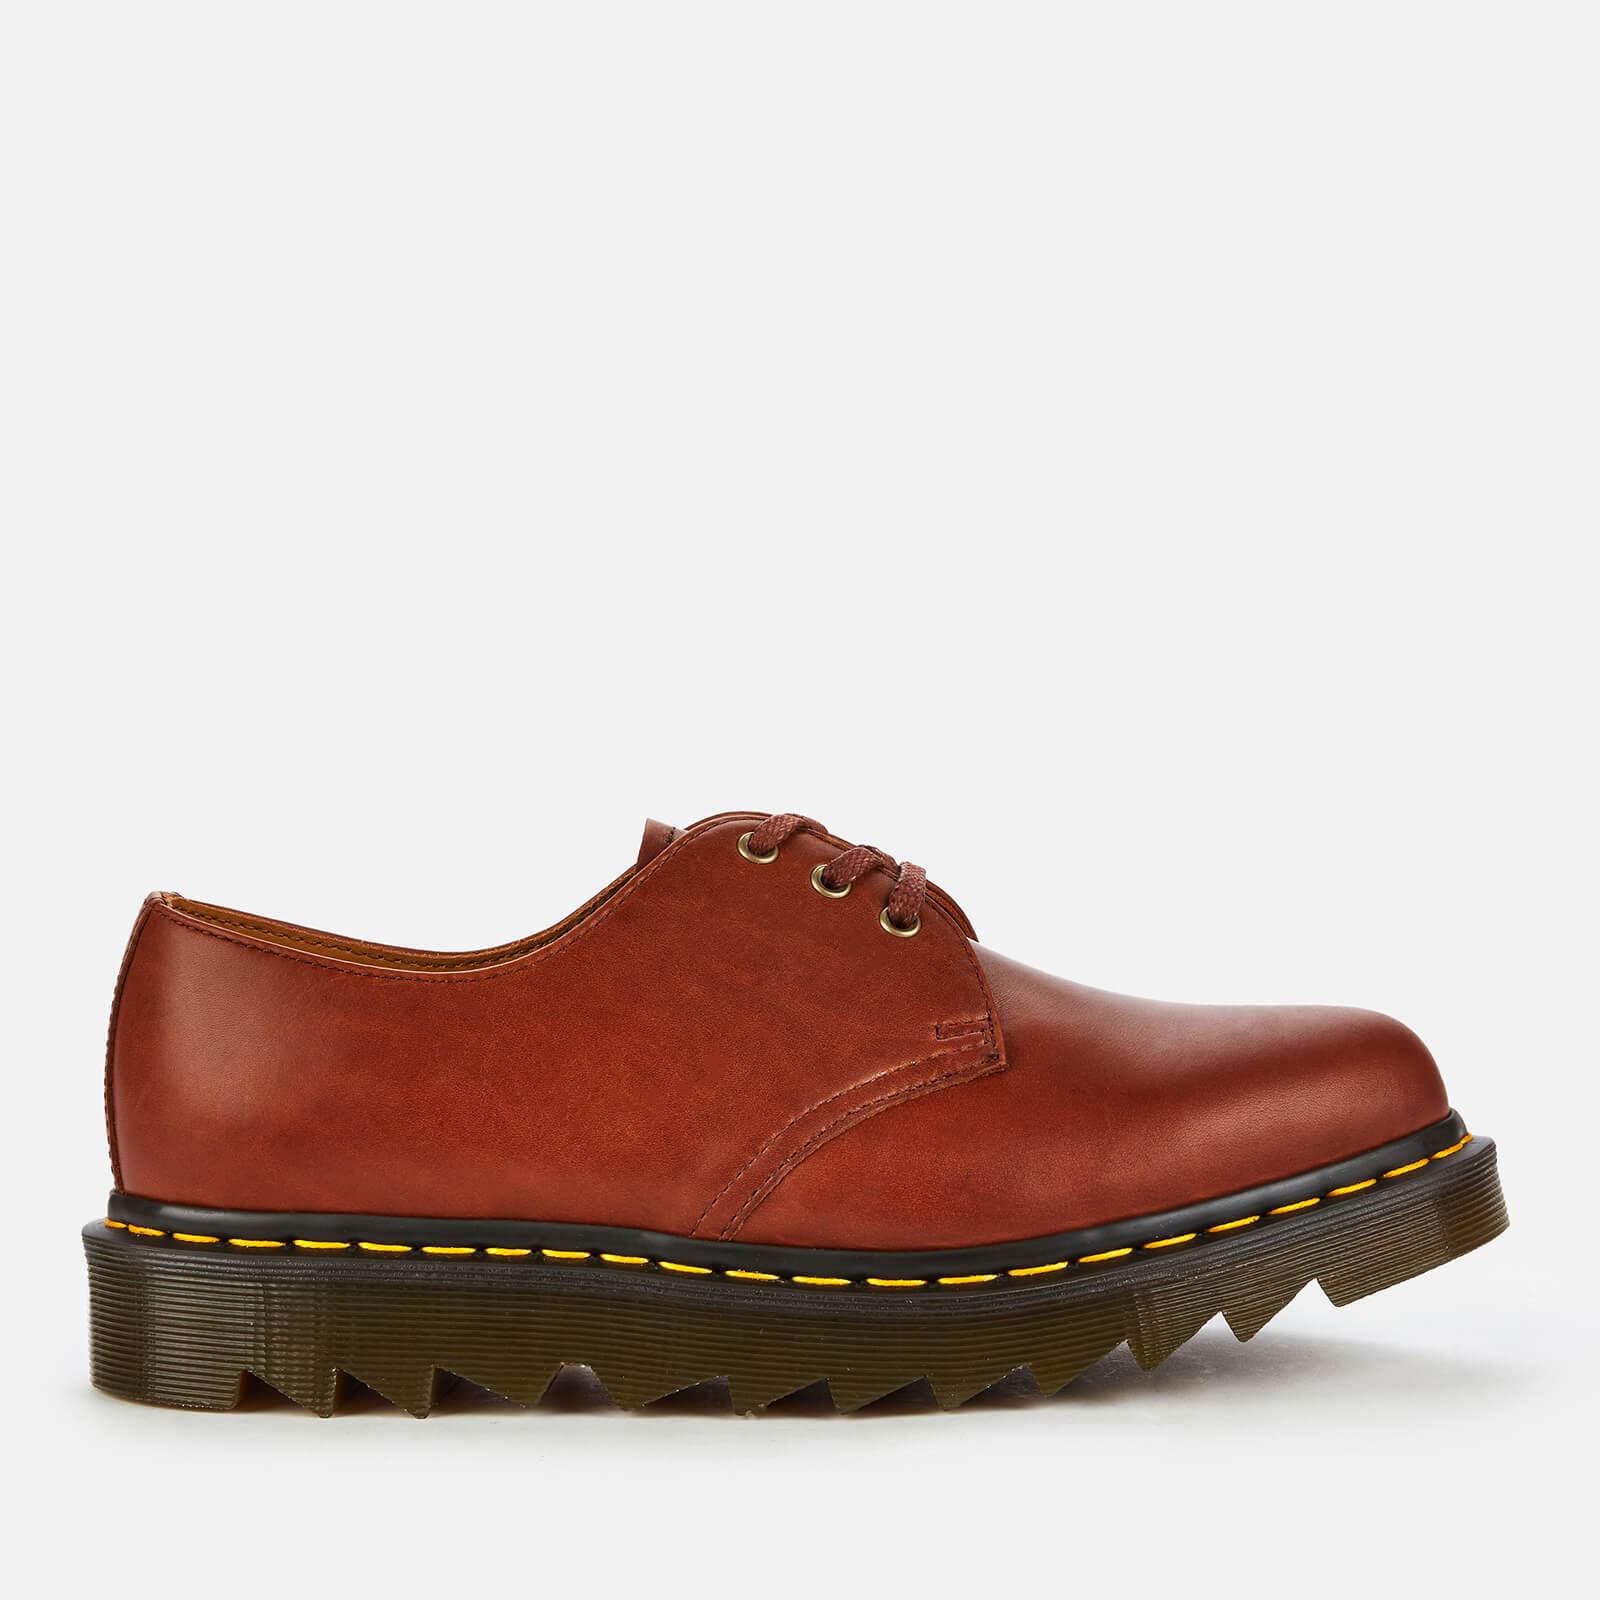 Dr. Martens Men's 1461 Ziggy Leather 3-Eye Shoes - Tan - UK 7